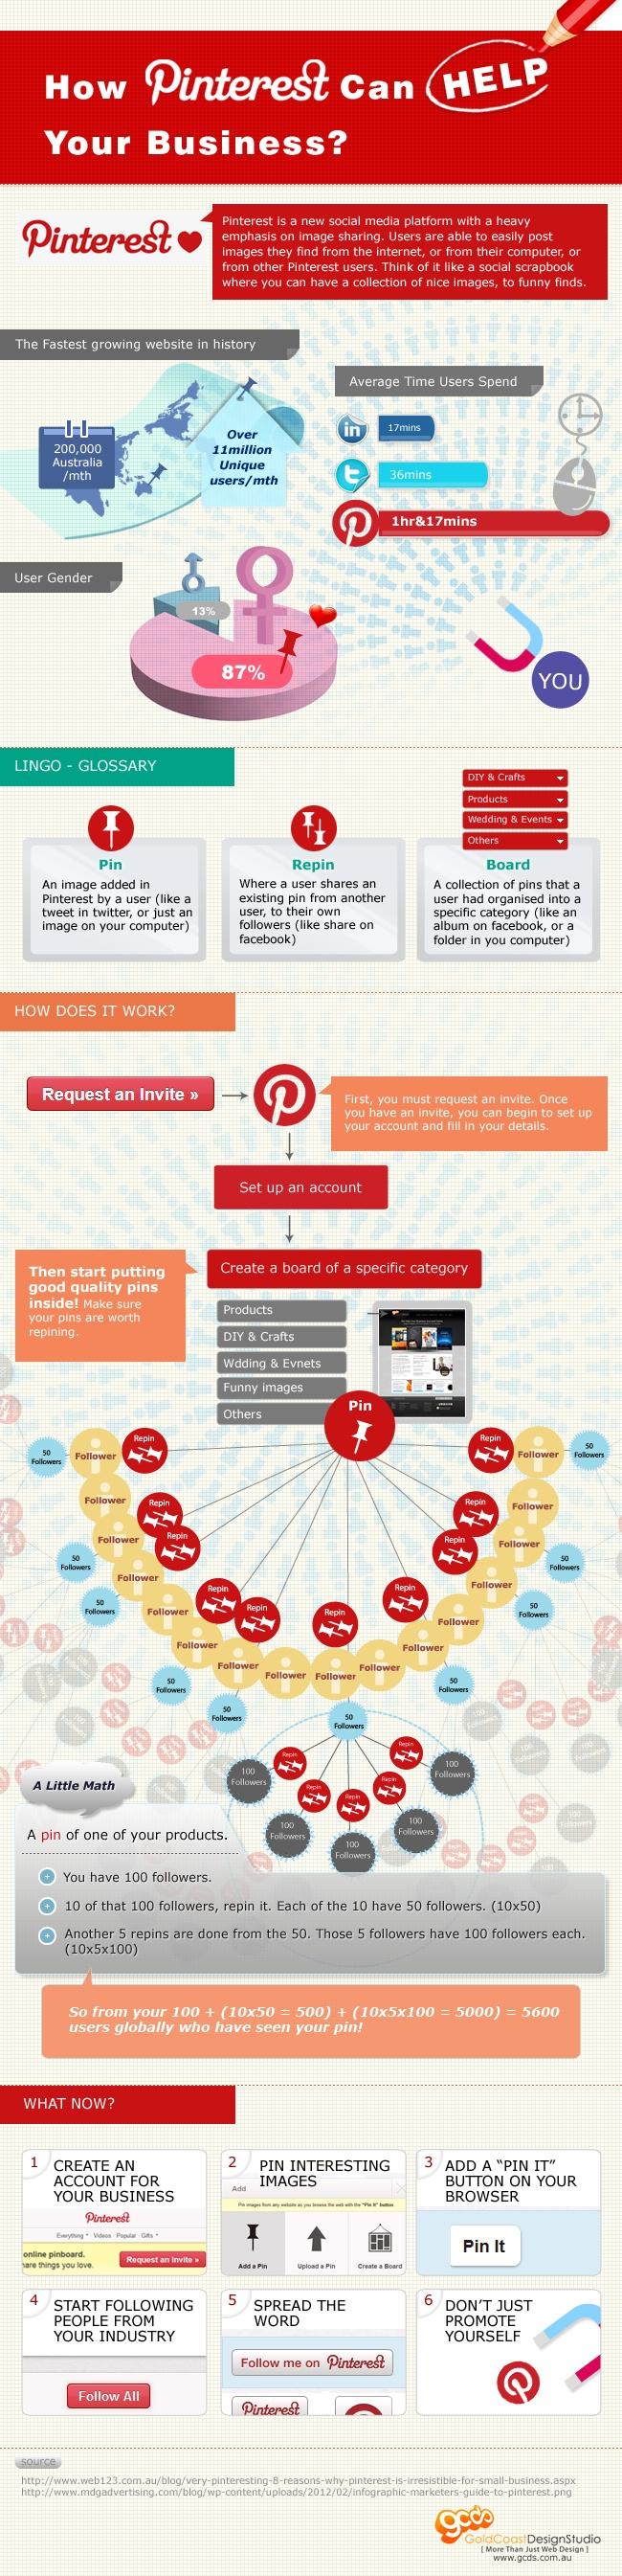 Cómo Pinteret puede ayudar a tu empresa #infografia #infographic #socialmedia